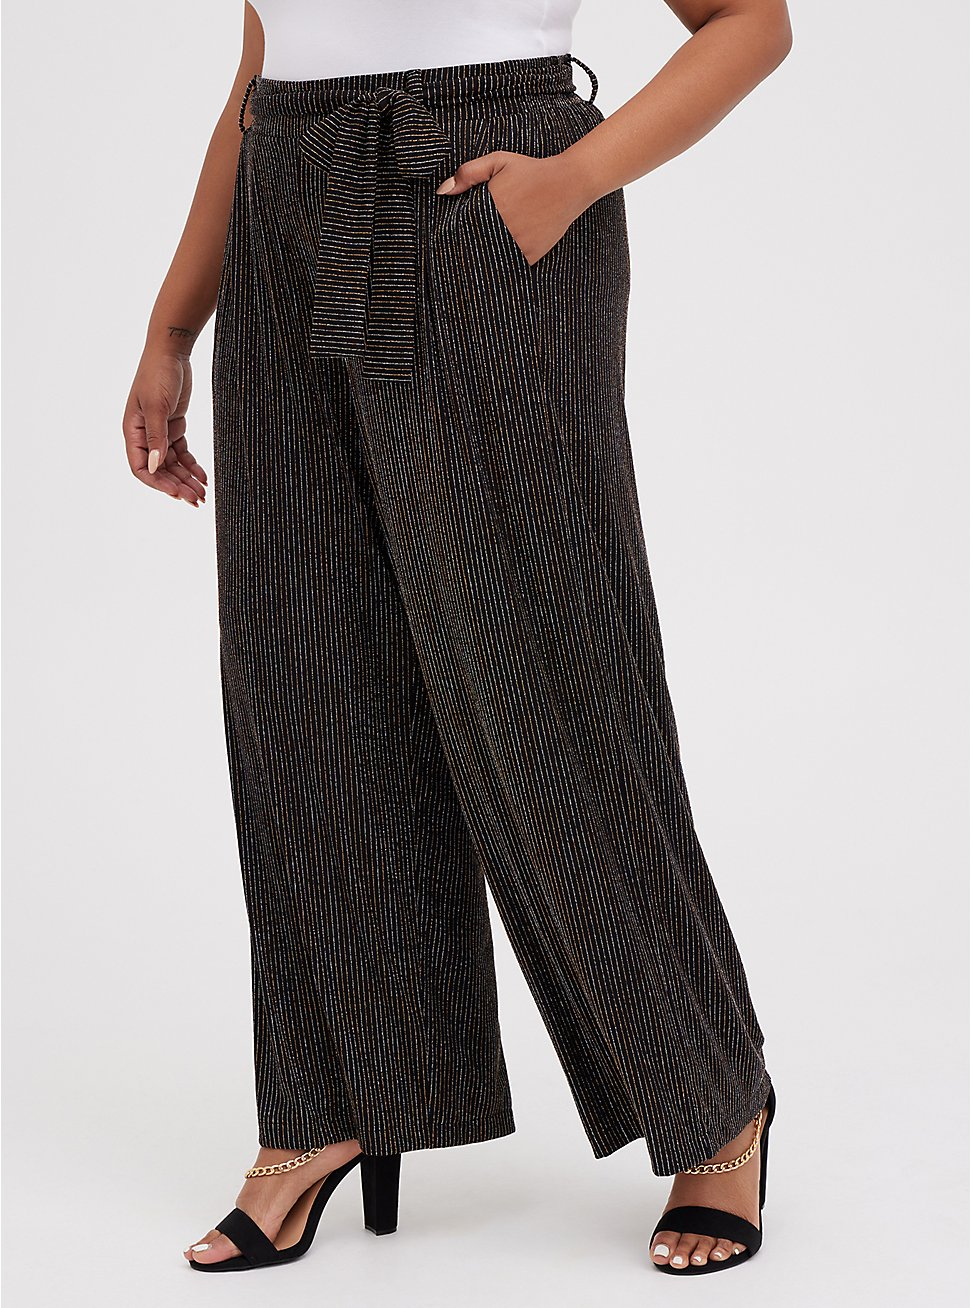 Black Lurex Self-Tie Wide Leg Pant, STRIPE -BLACK, hi-res